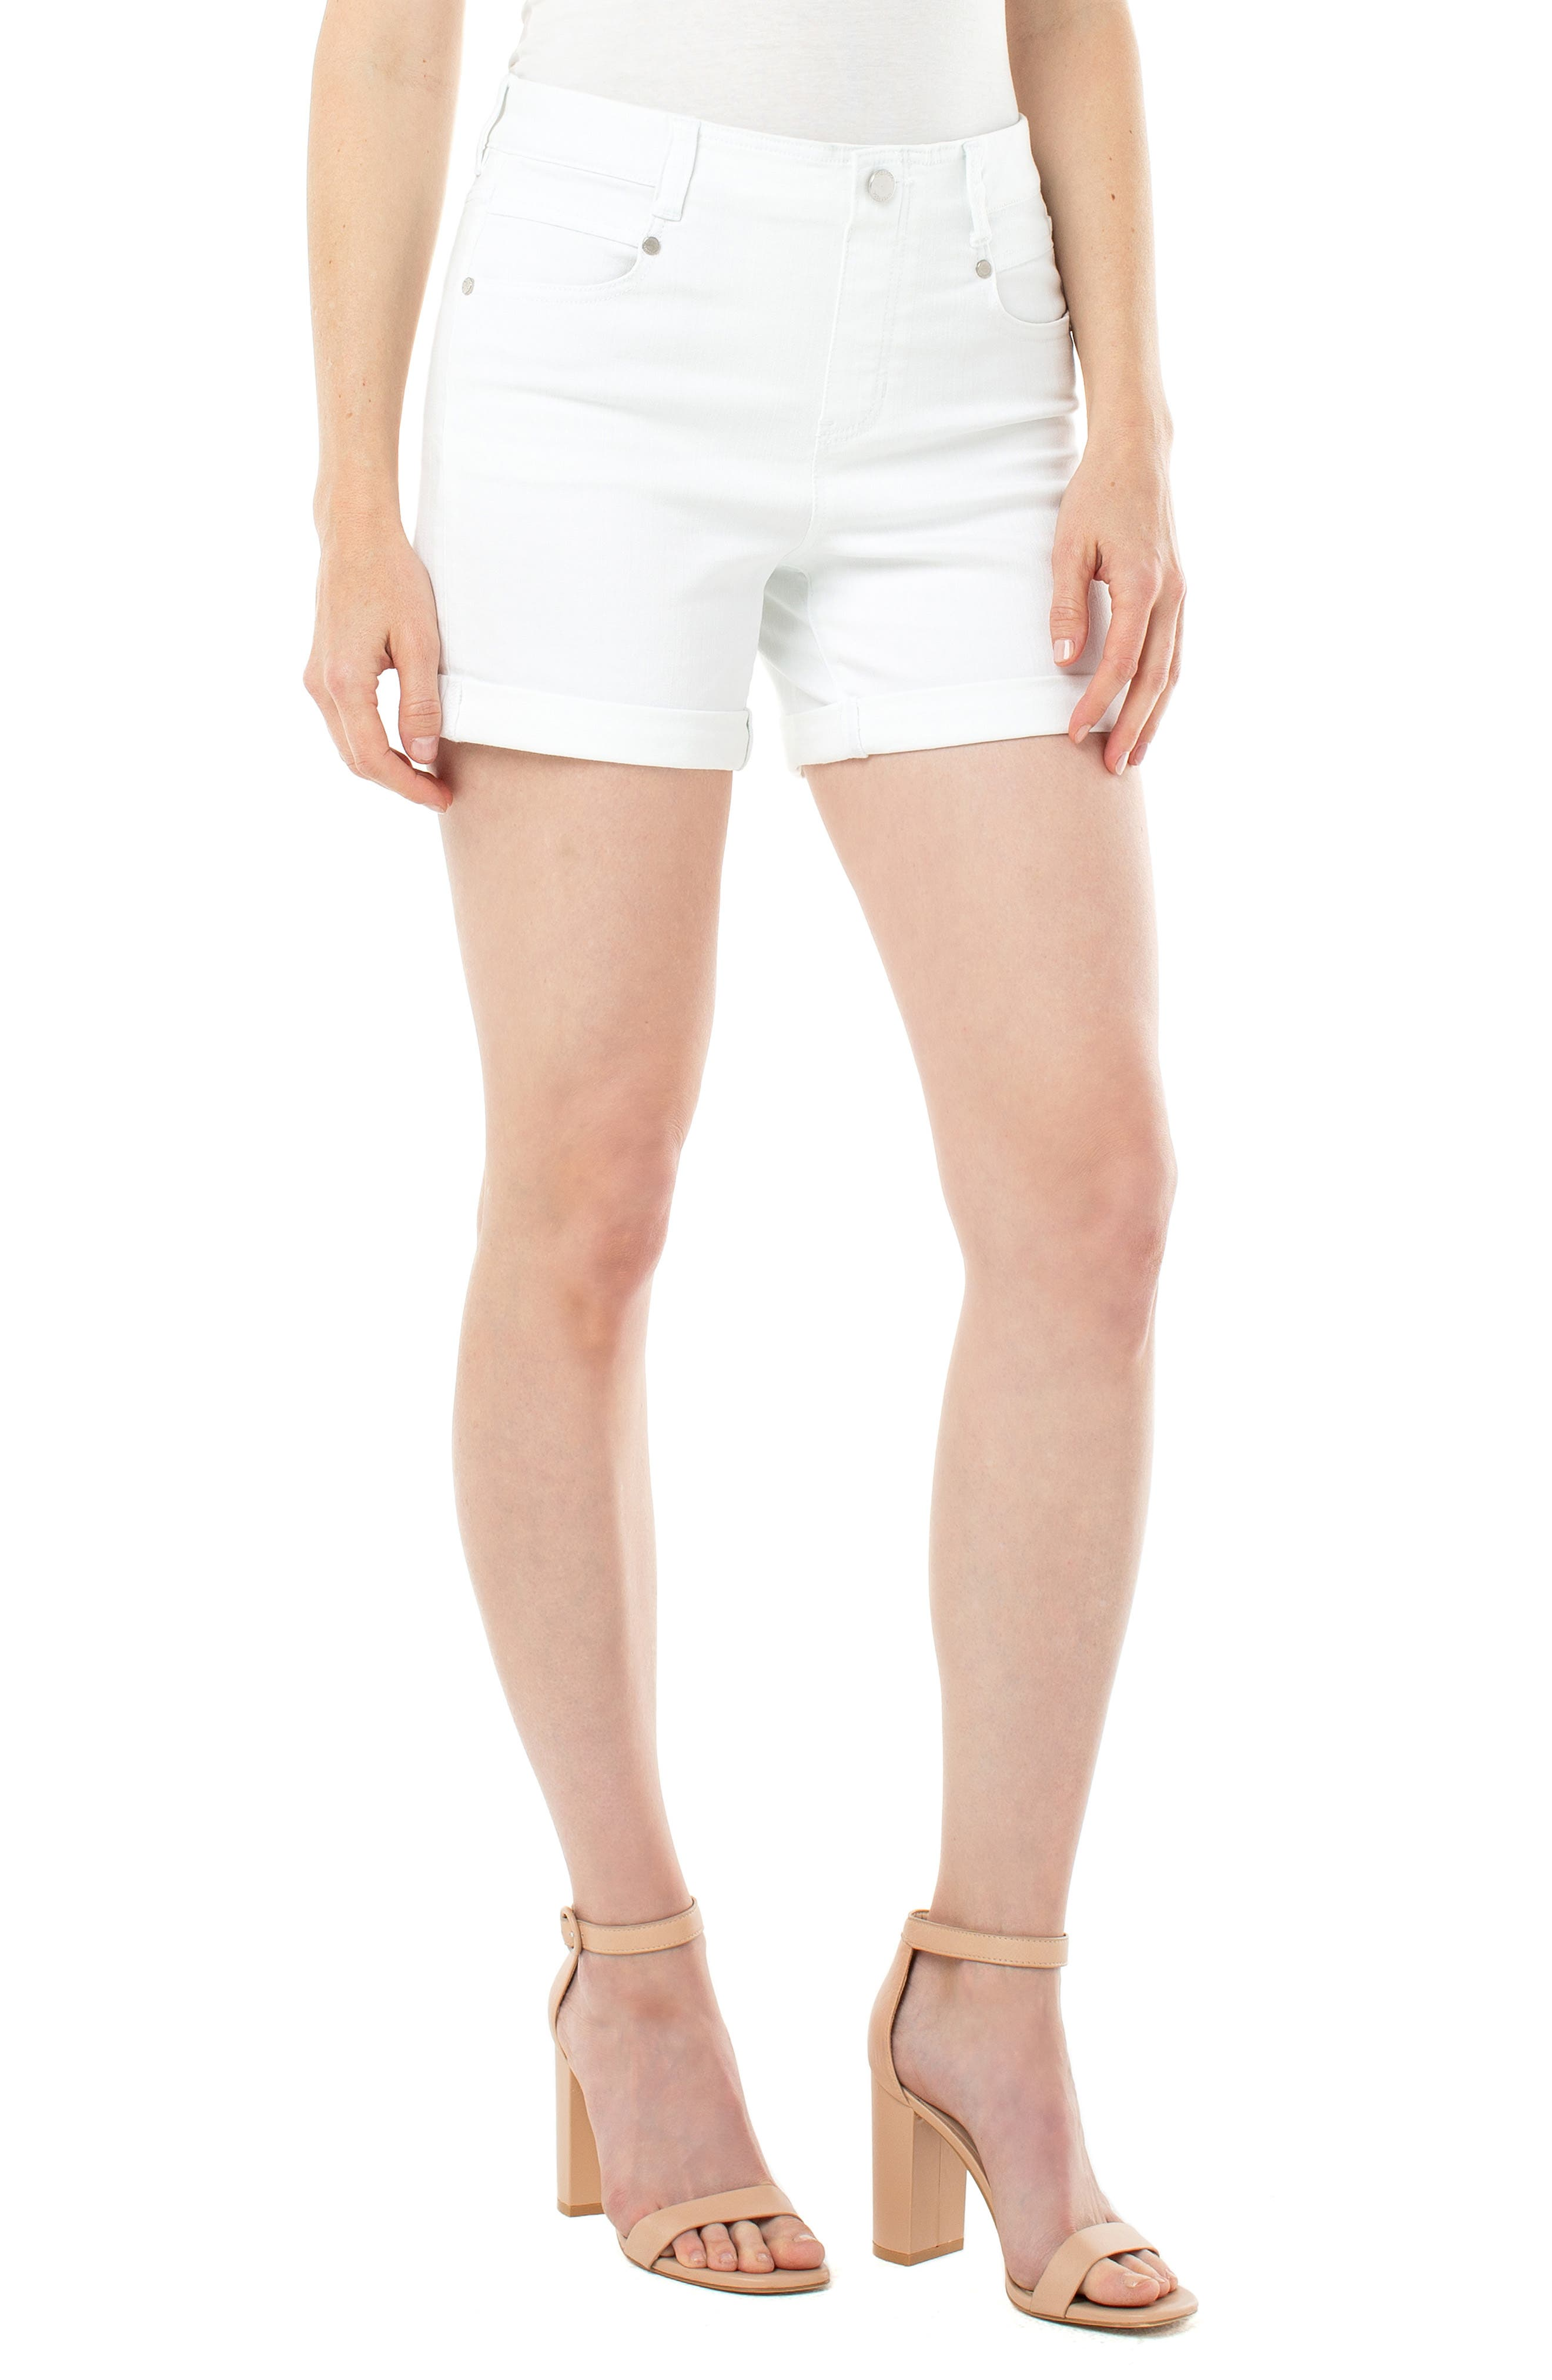 Gia Glider High Waist Roll Cuff Shorts